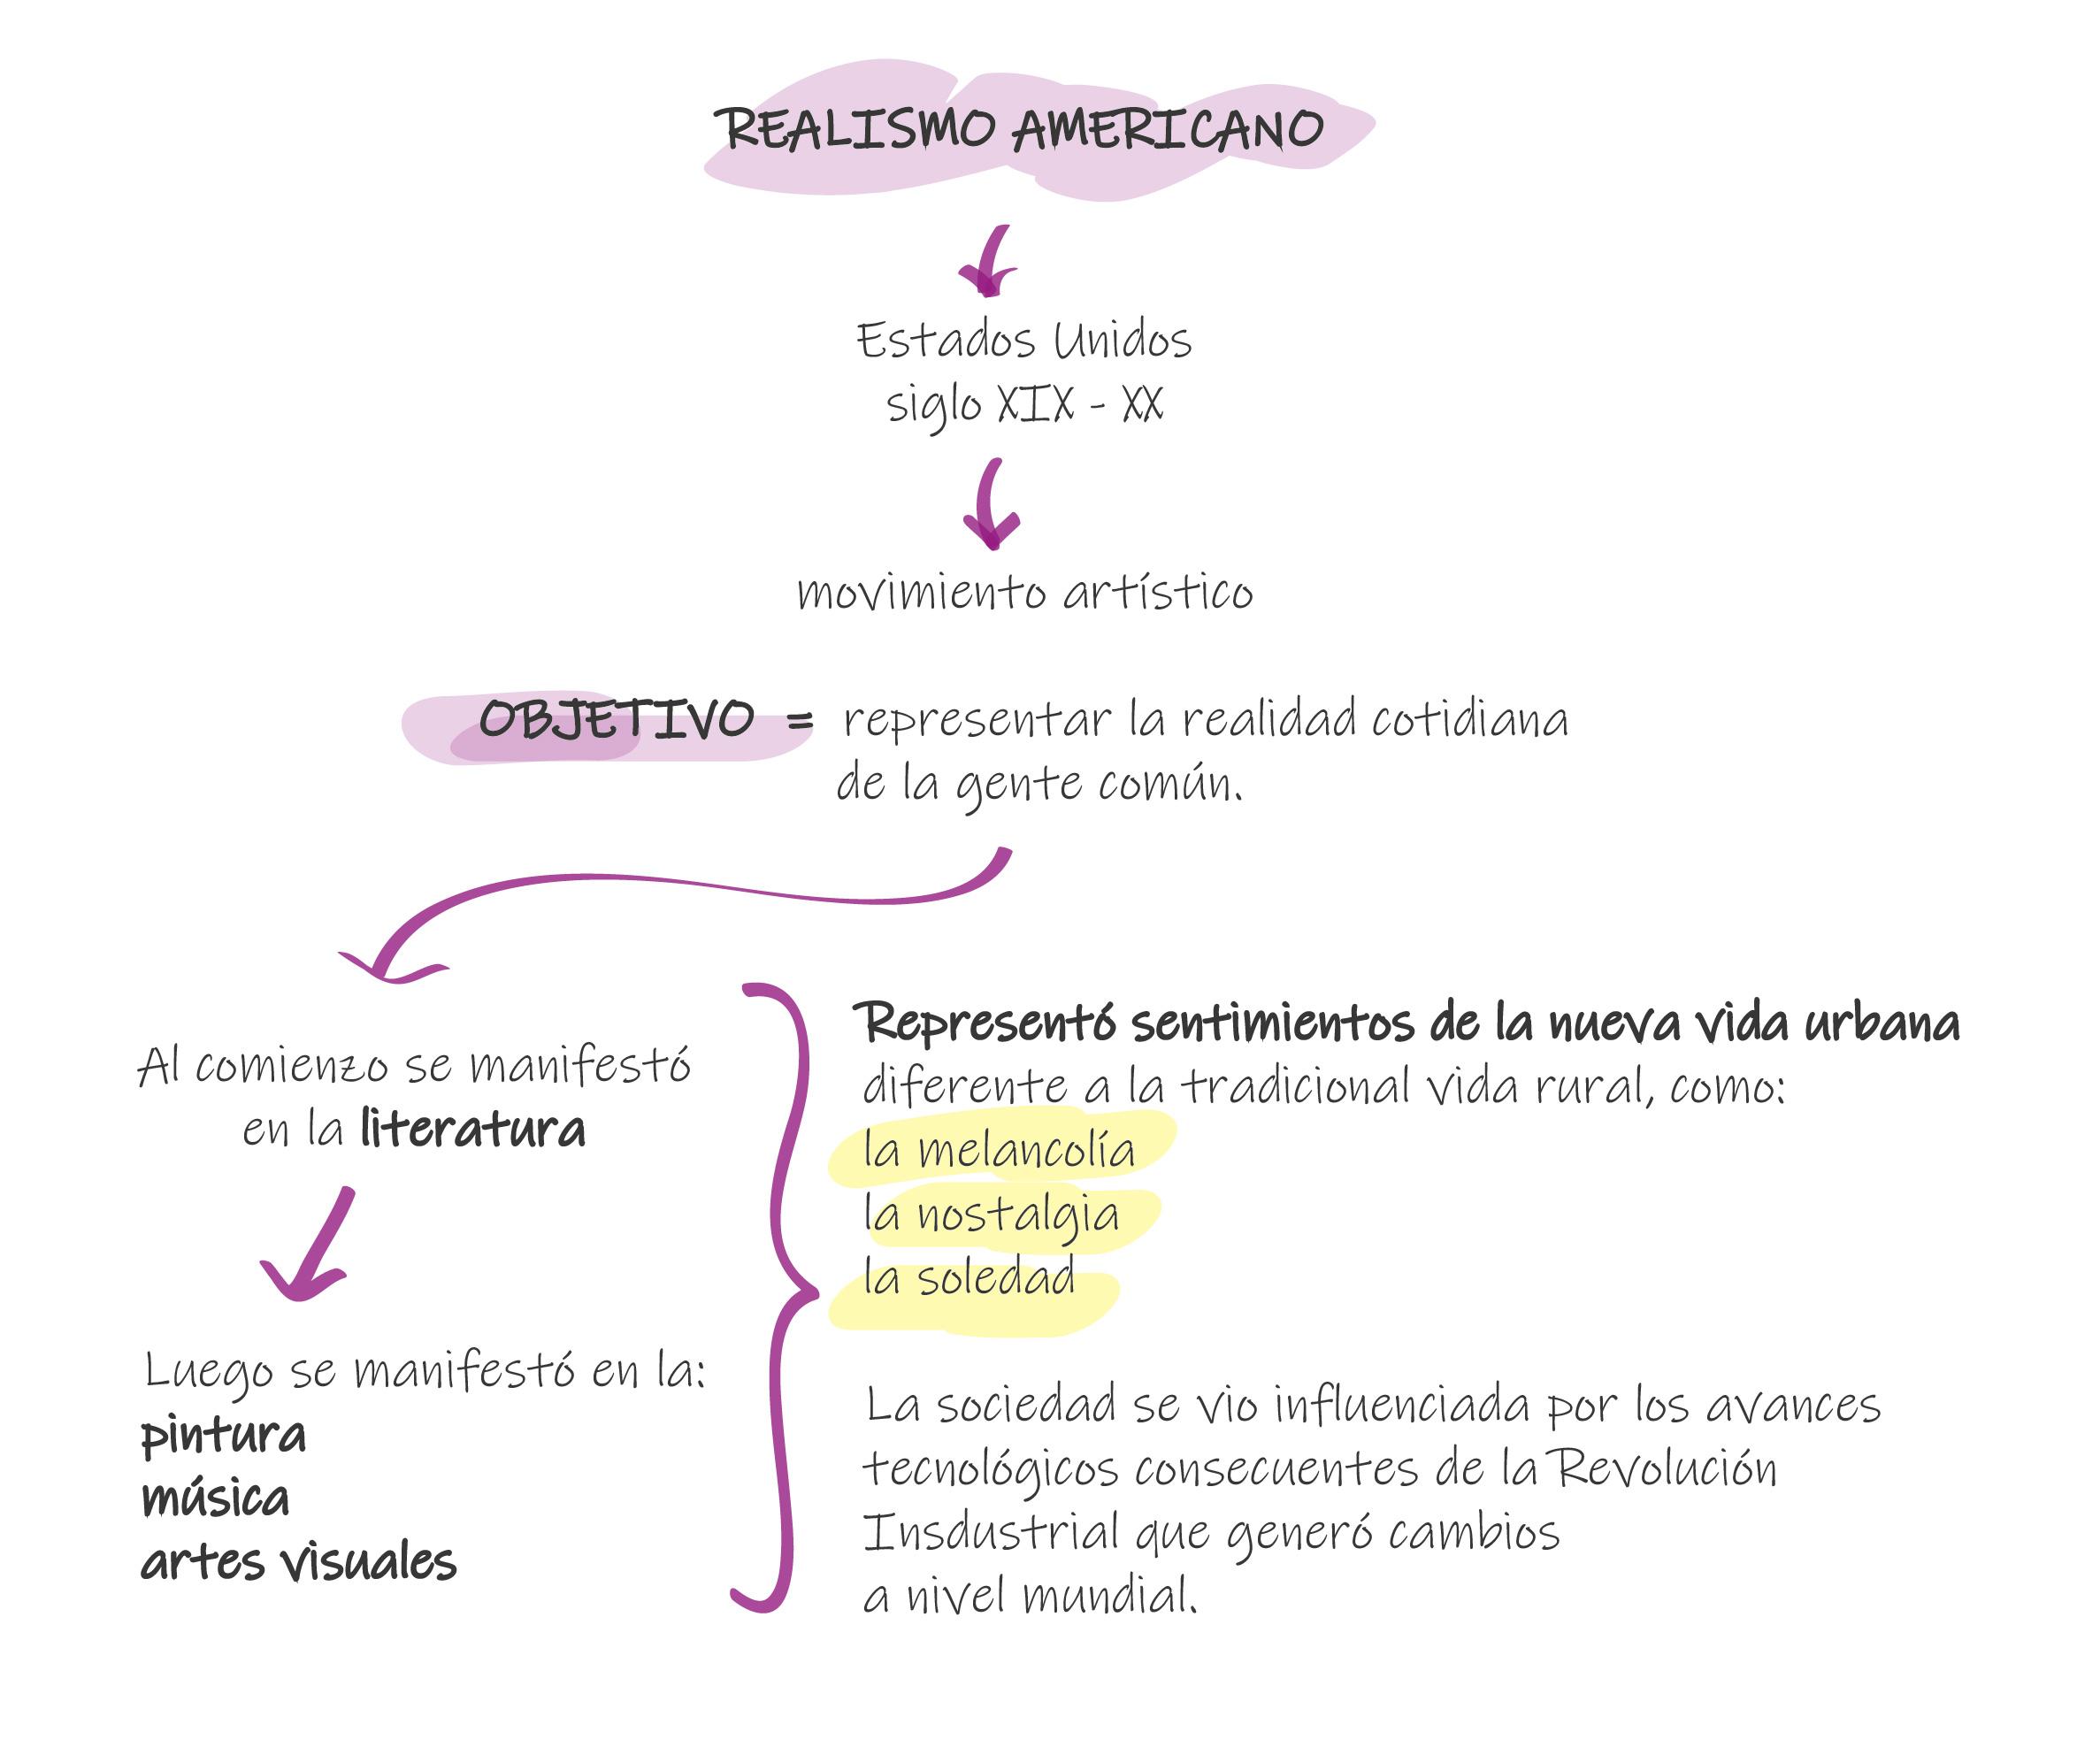 Grafico_realismo.jpg